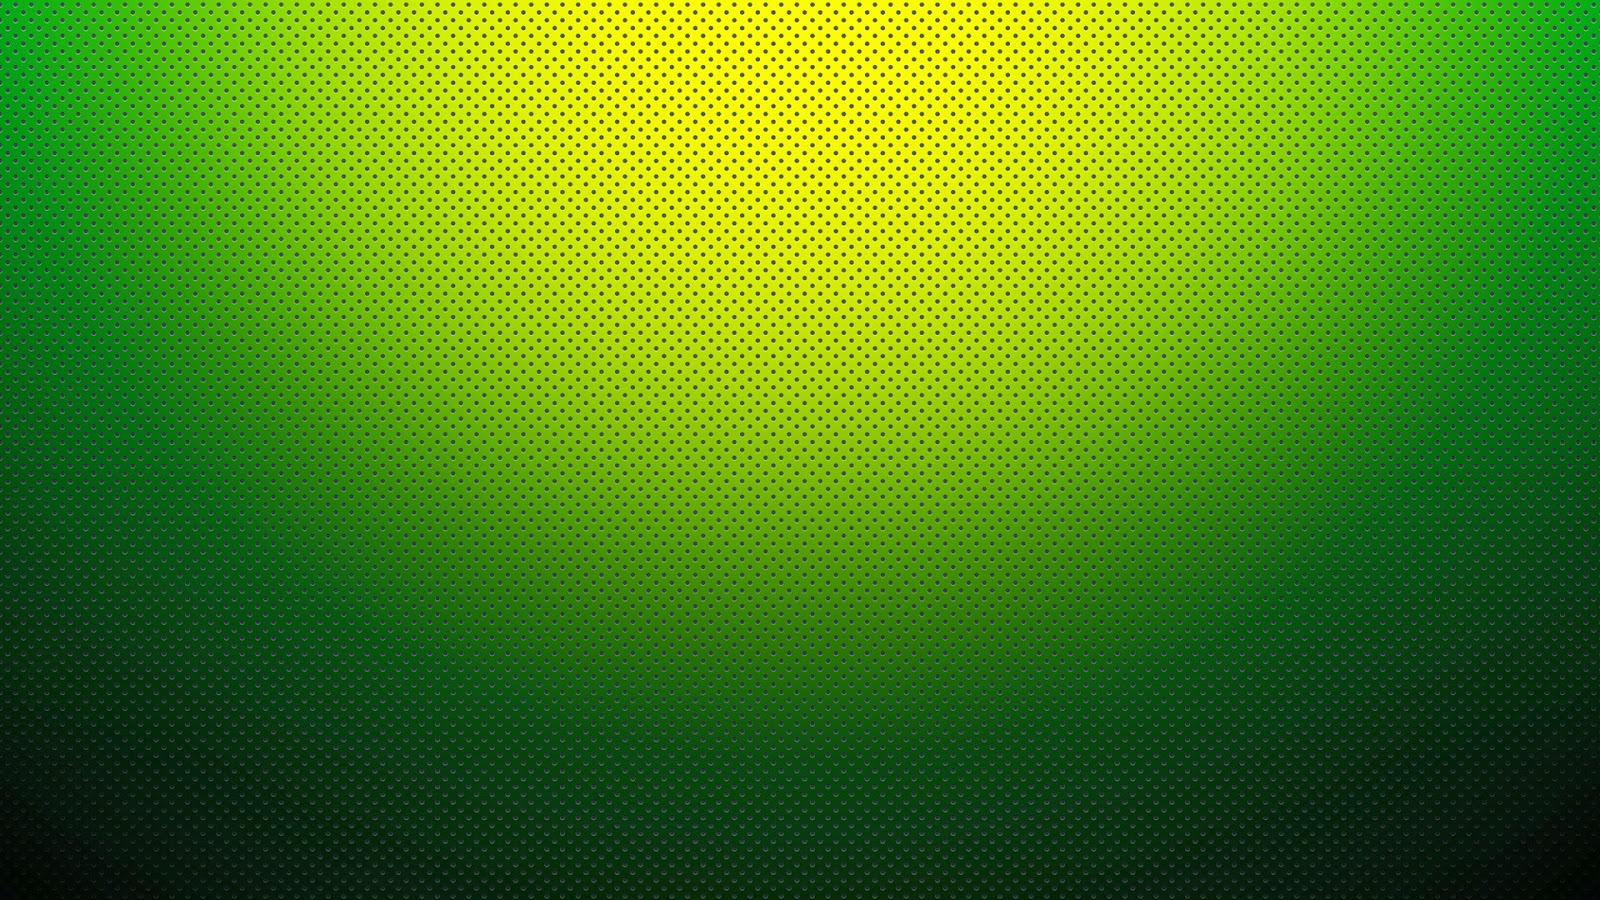 Green Background Images For Websites Hd Background